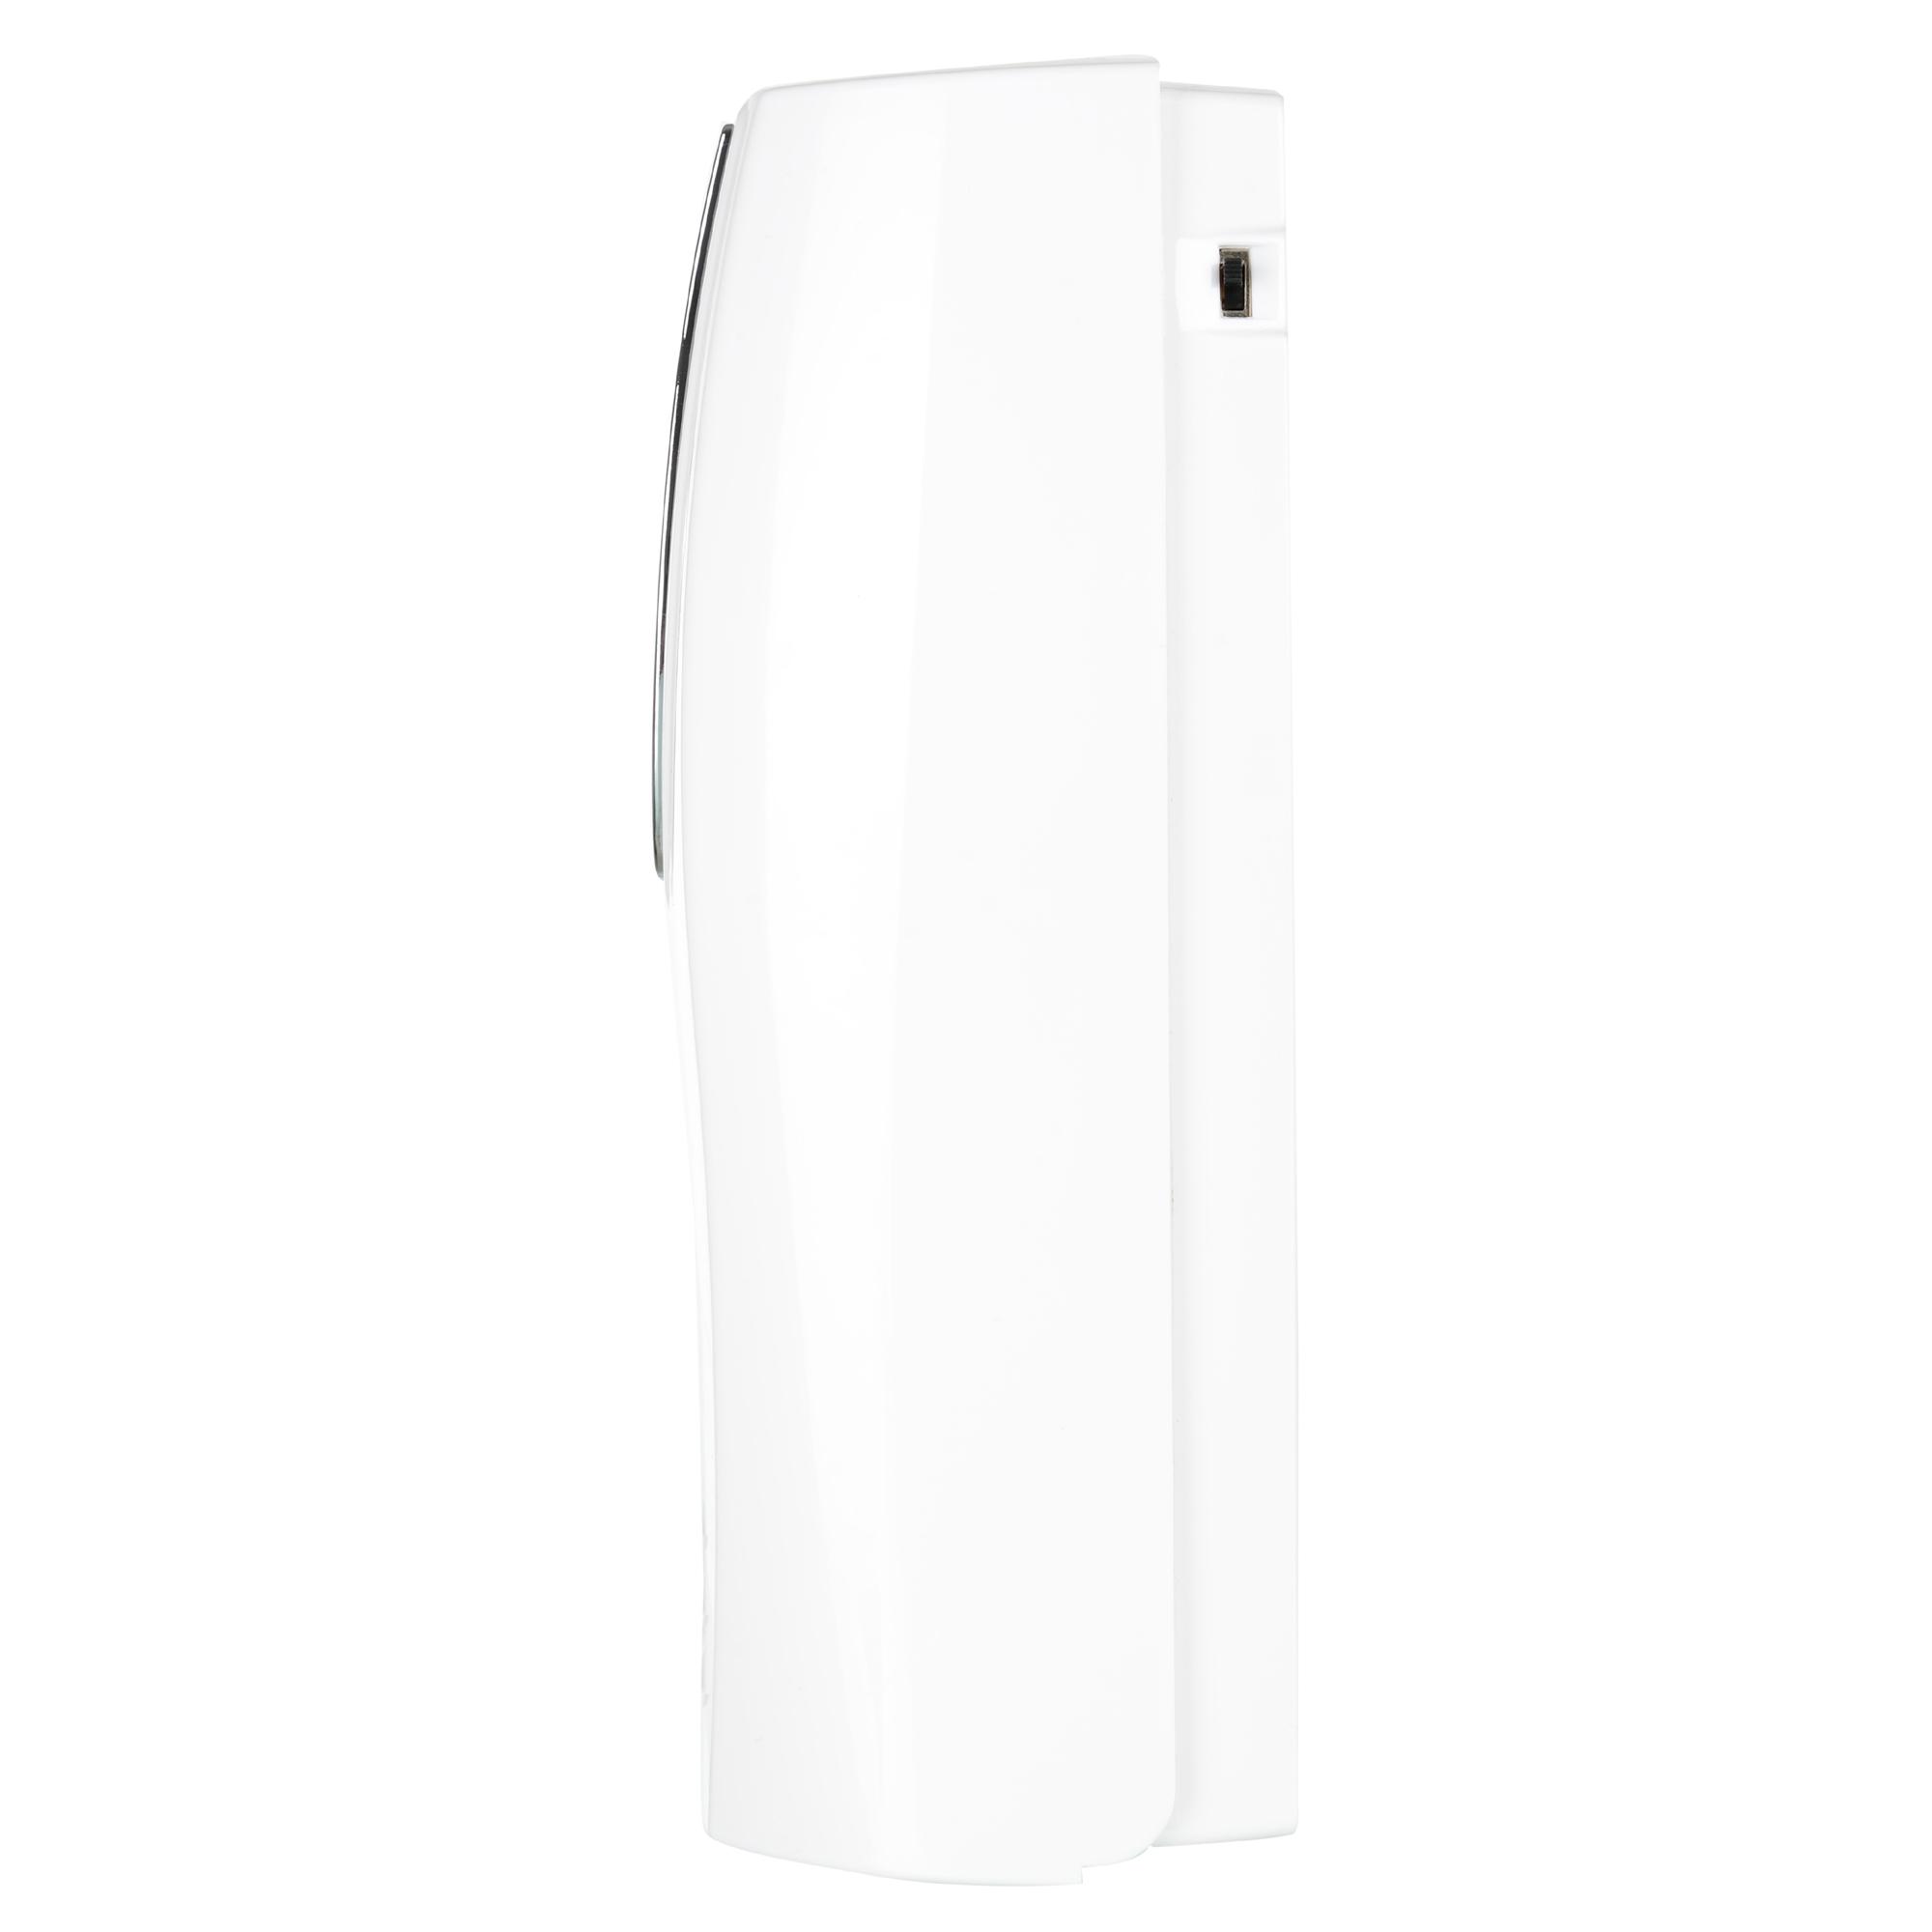 Aerosole Dispenser